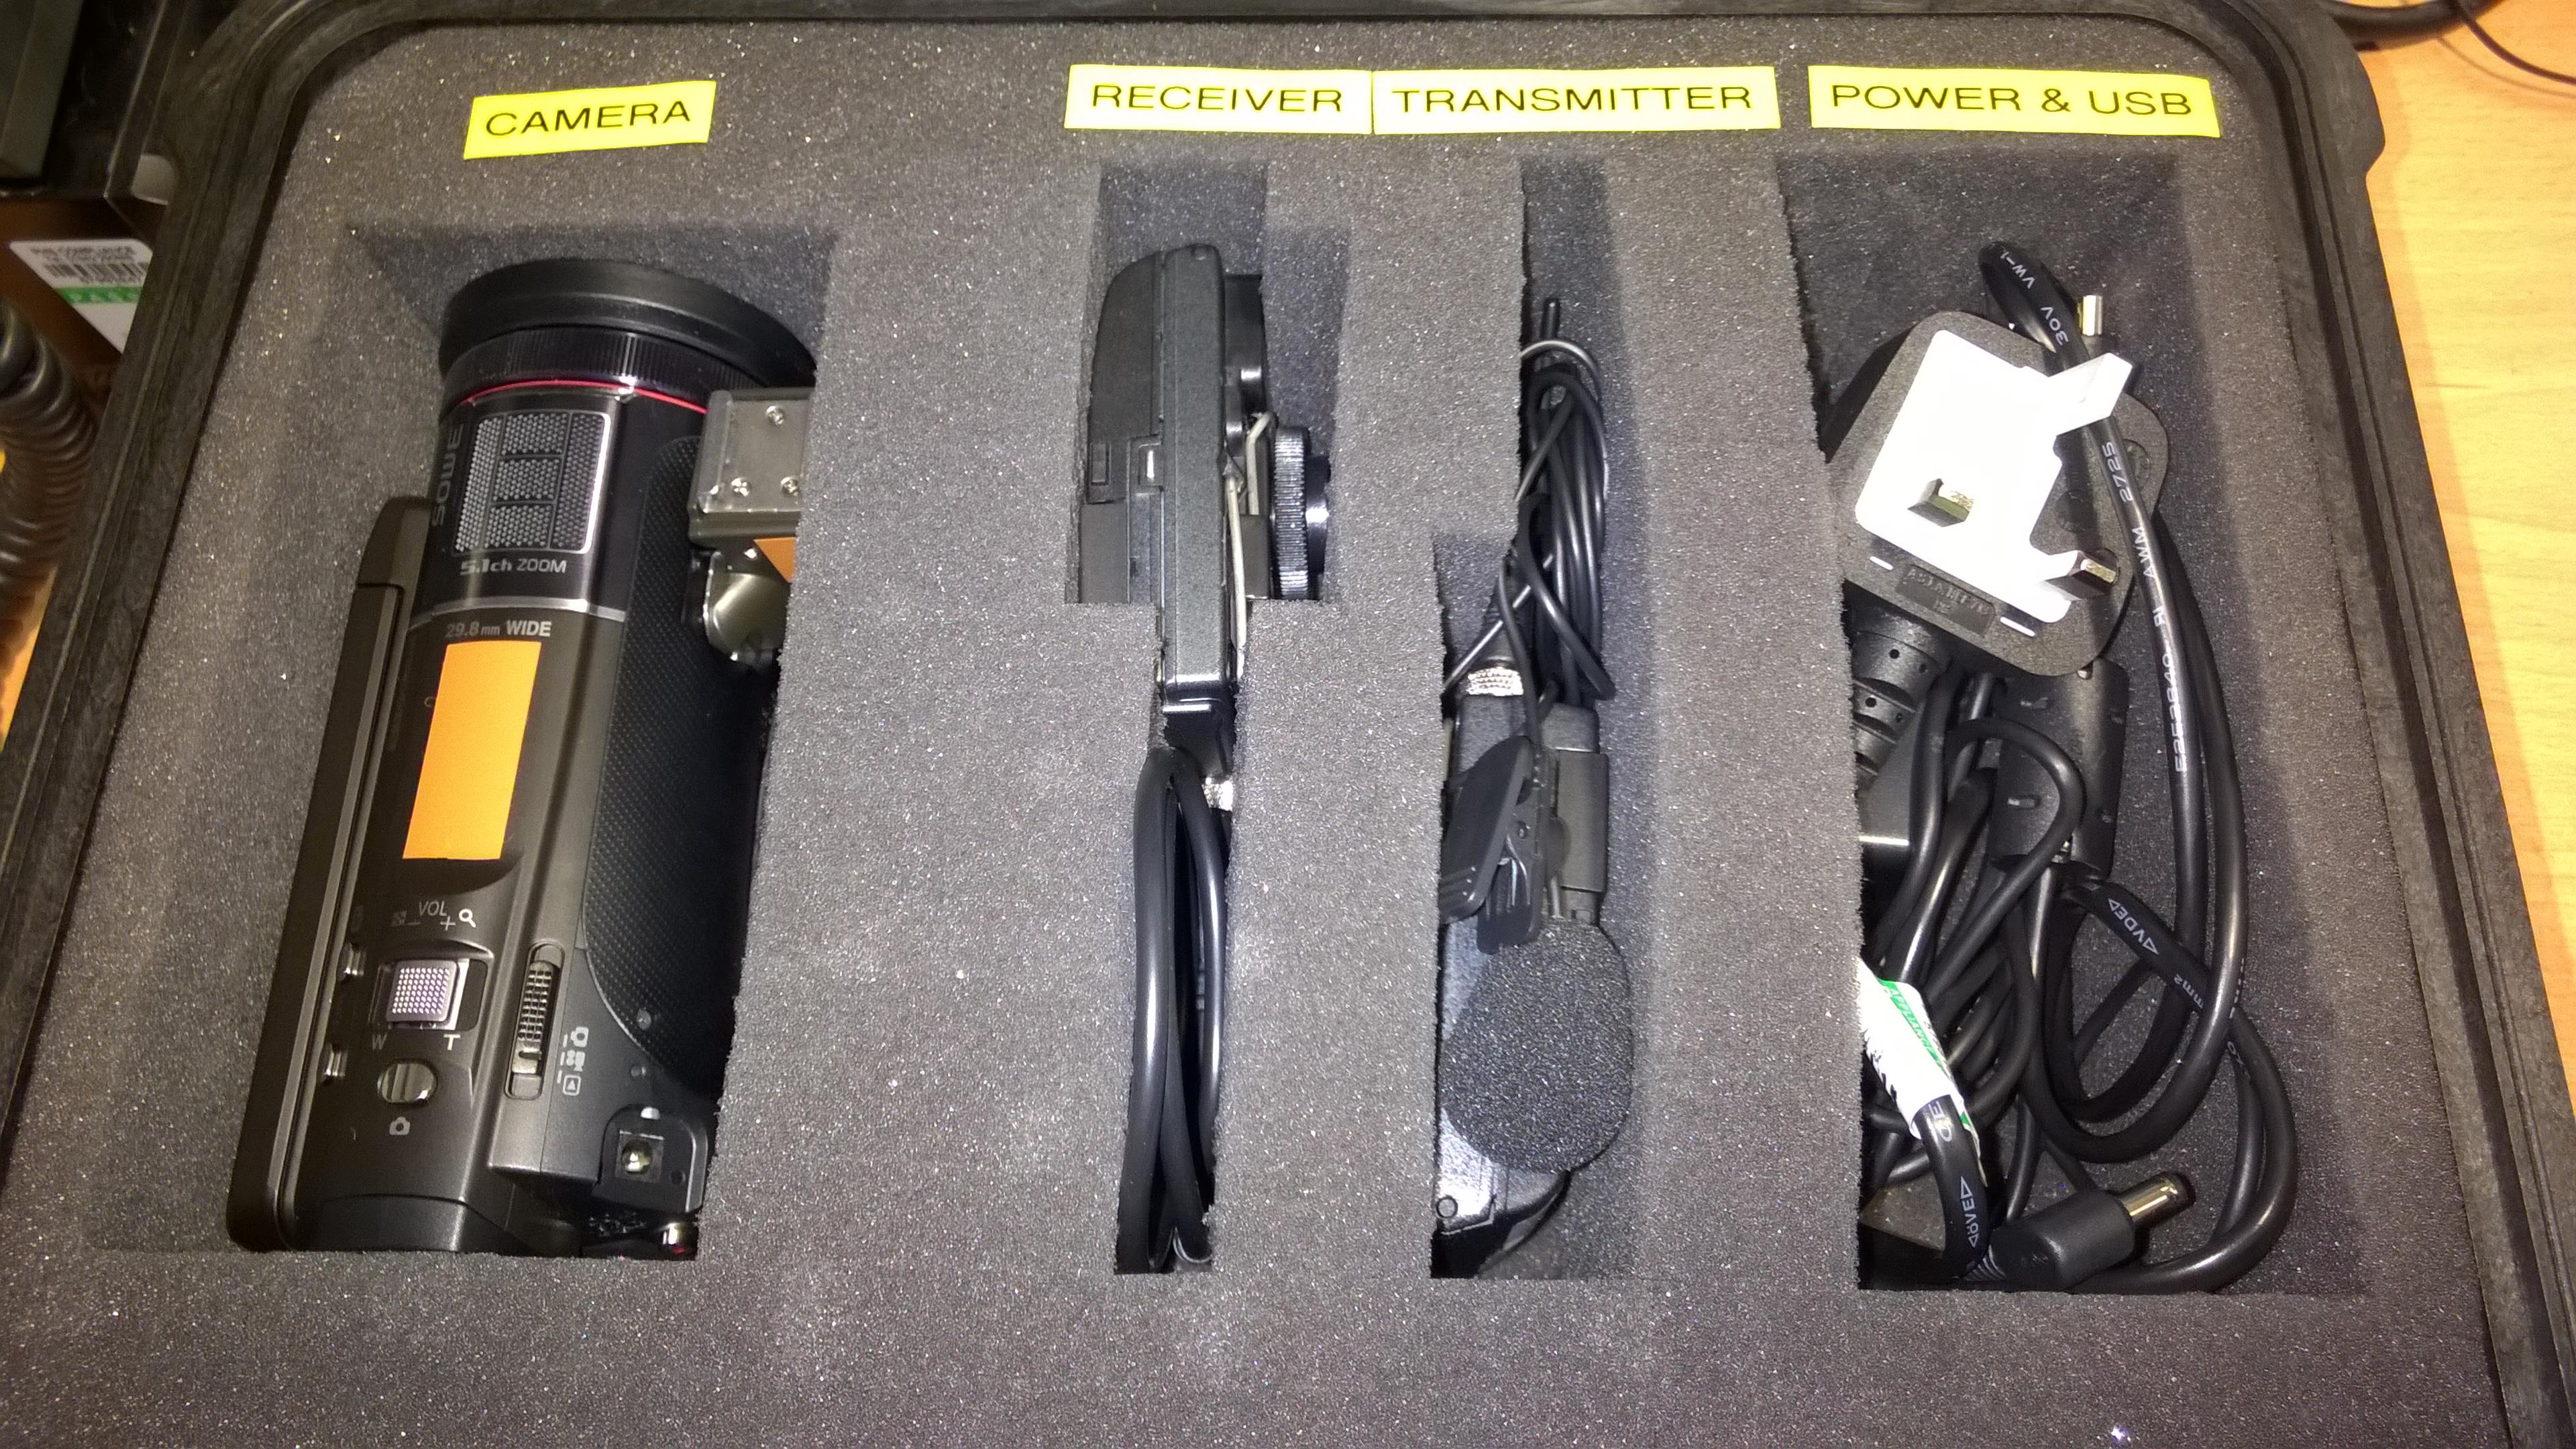 Panasonic HC-X920 Camera Instructions